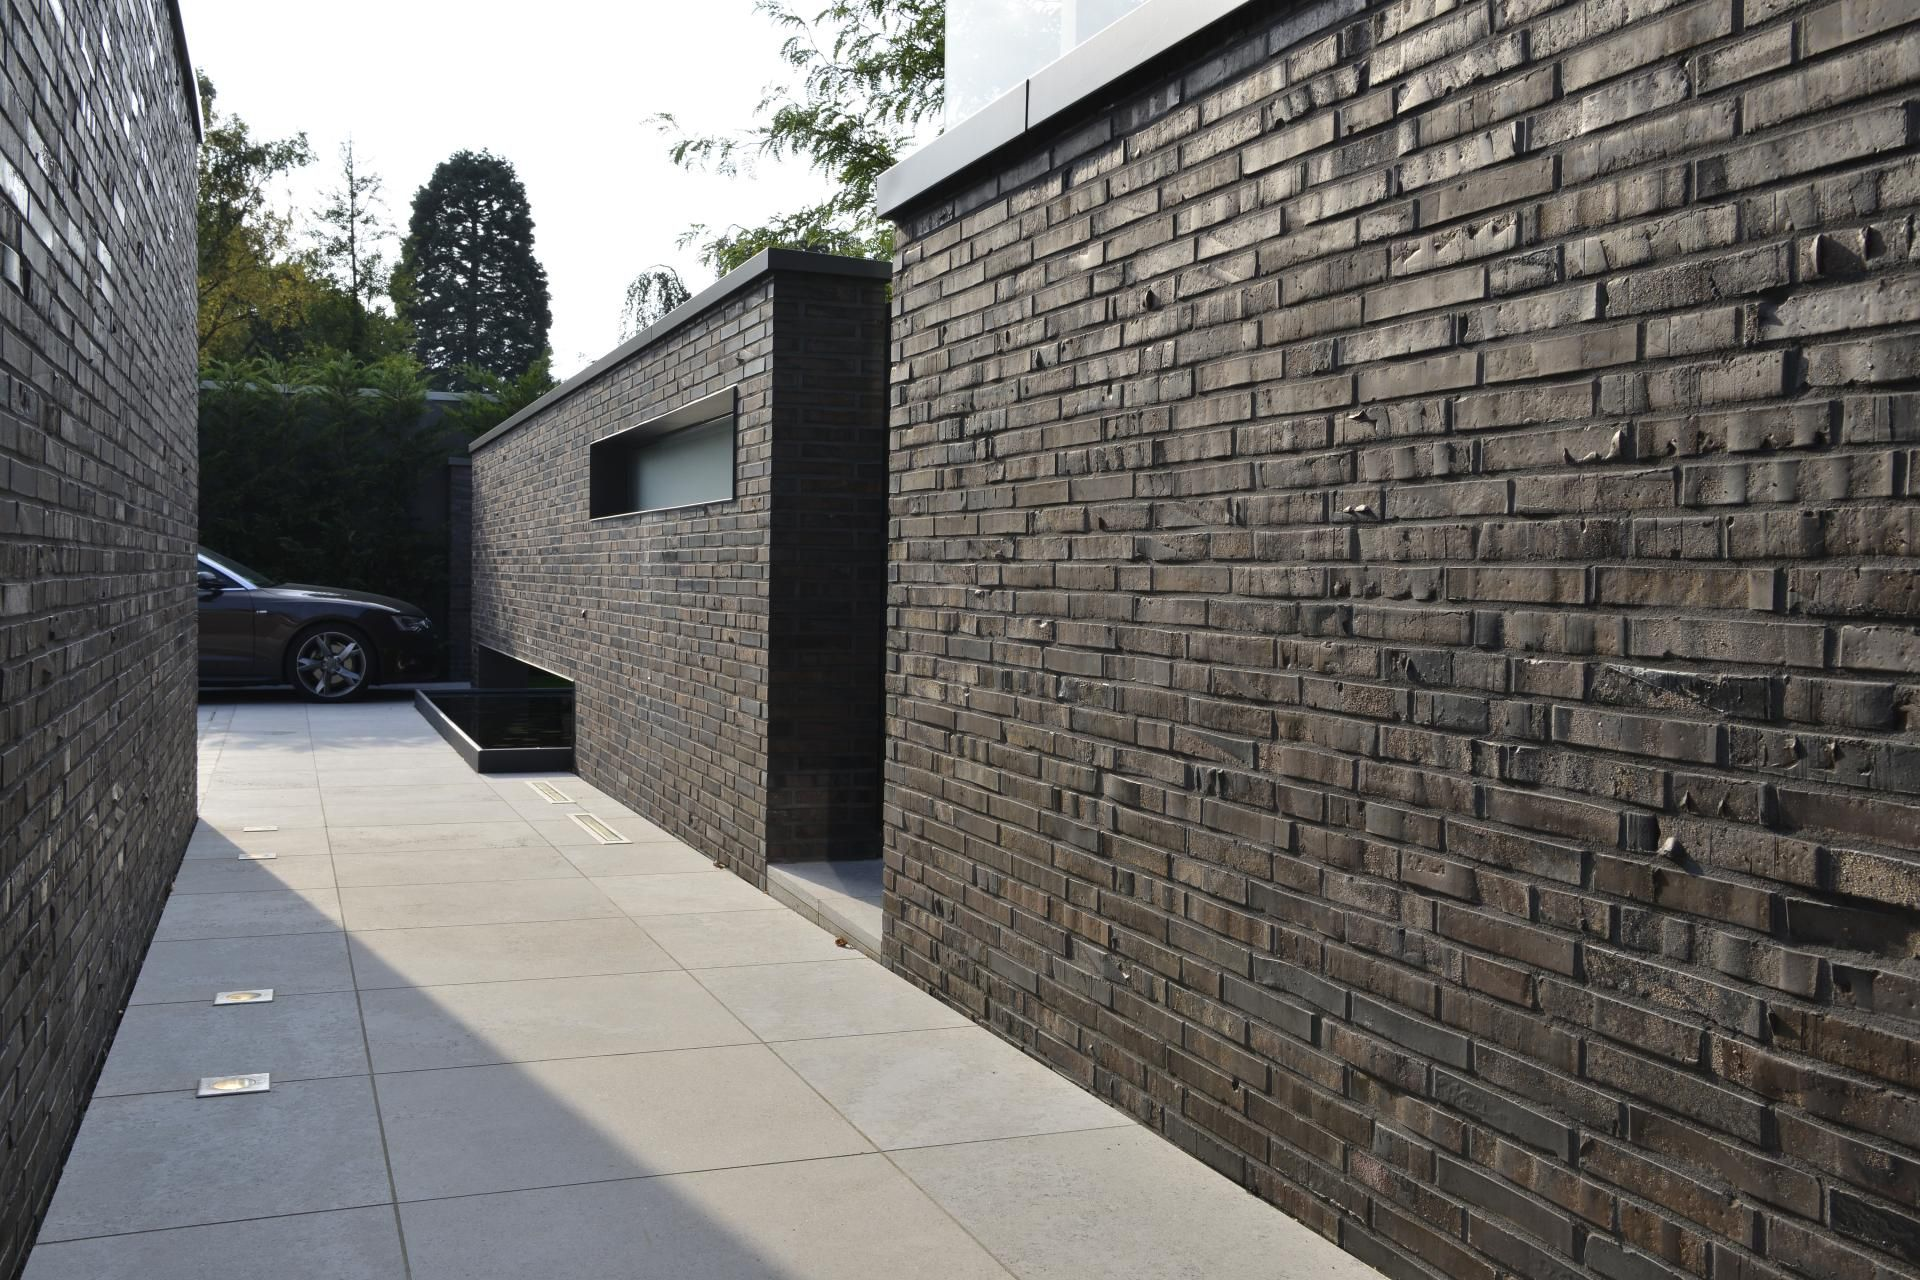 Gartenmauer Haus K Gillrath Klinker Gillrath Bricks Fassade Klinker Klinker Backsteinhauser